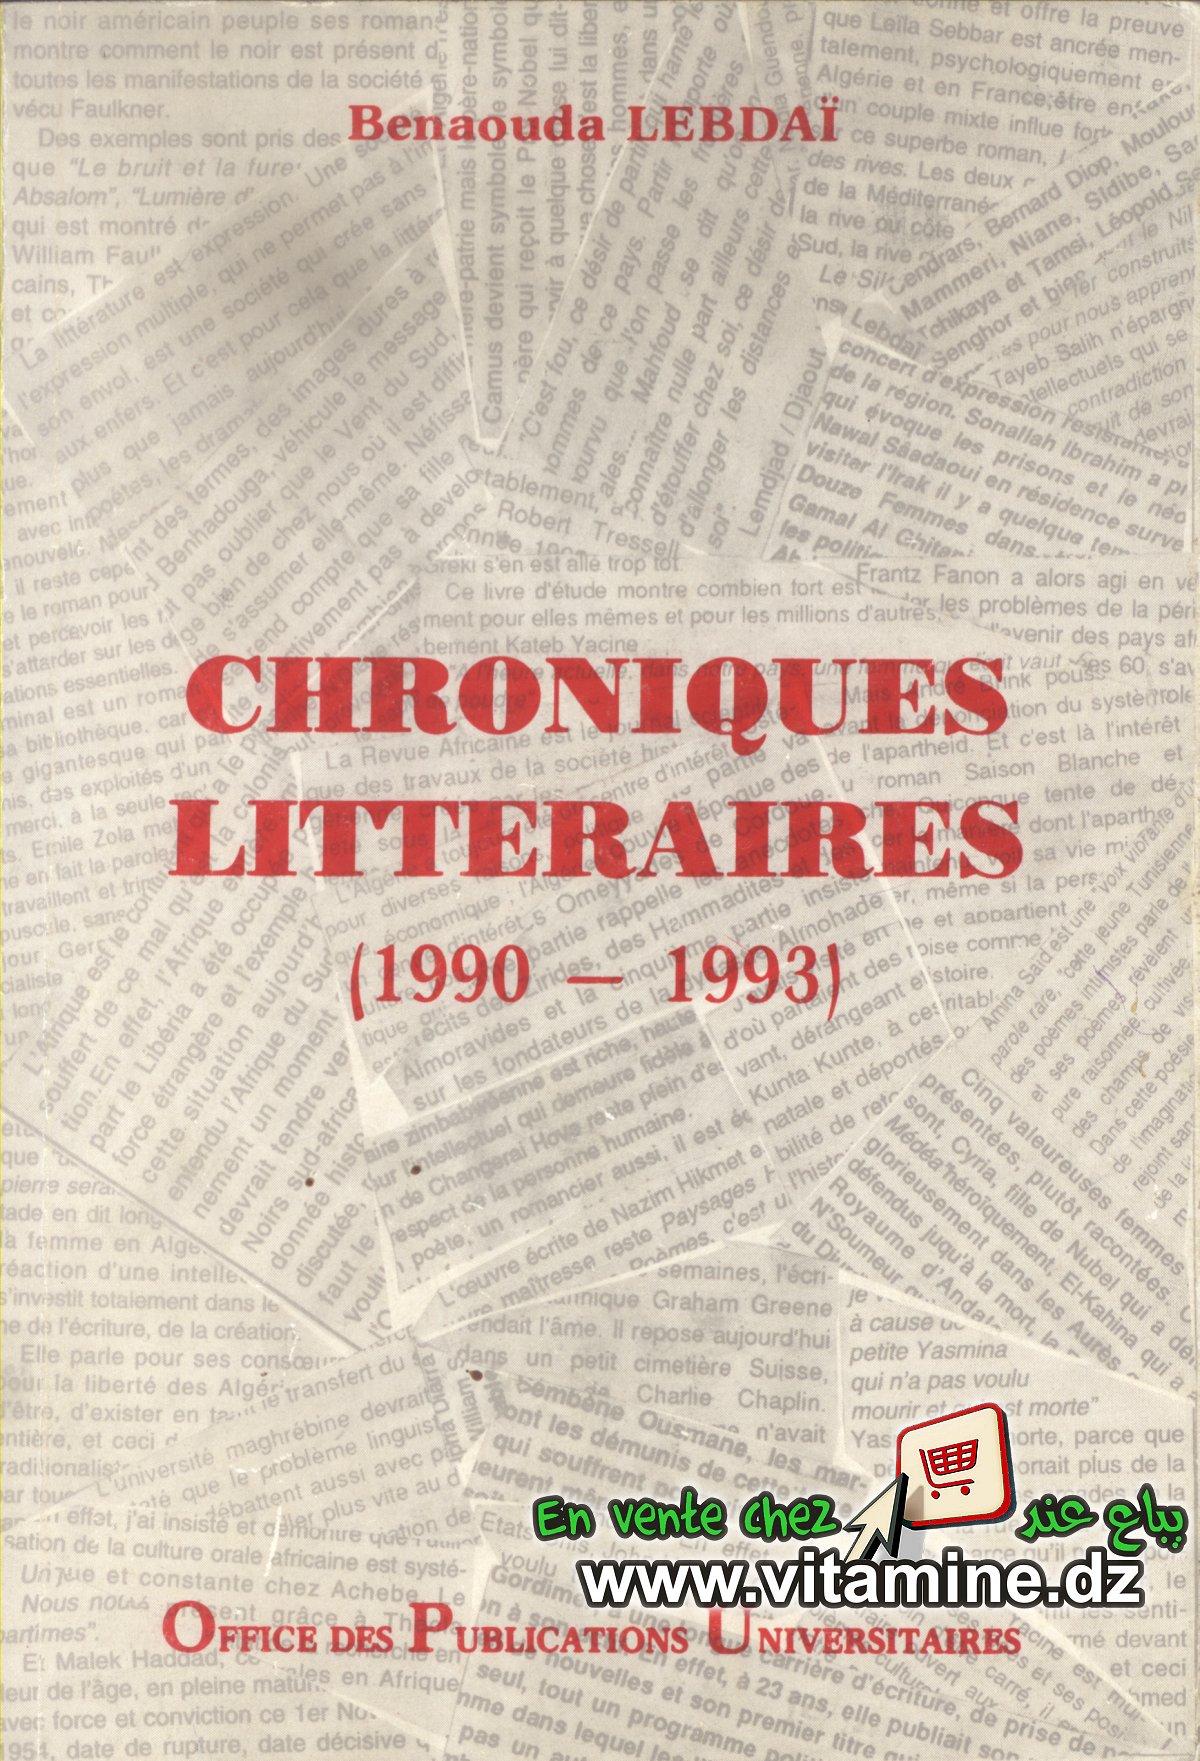 Benaouda Lebdai - Chroniques litteraires (1990 - 1993)